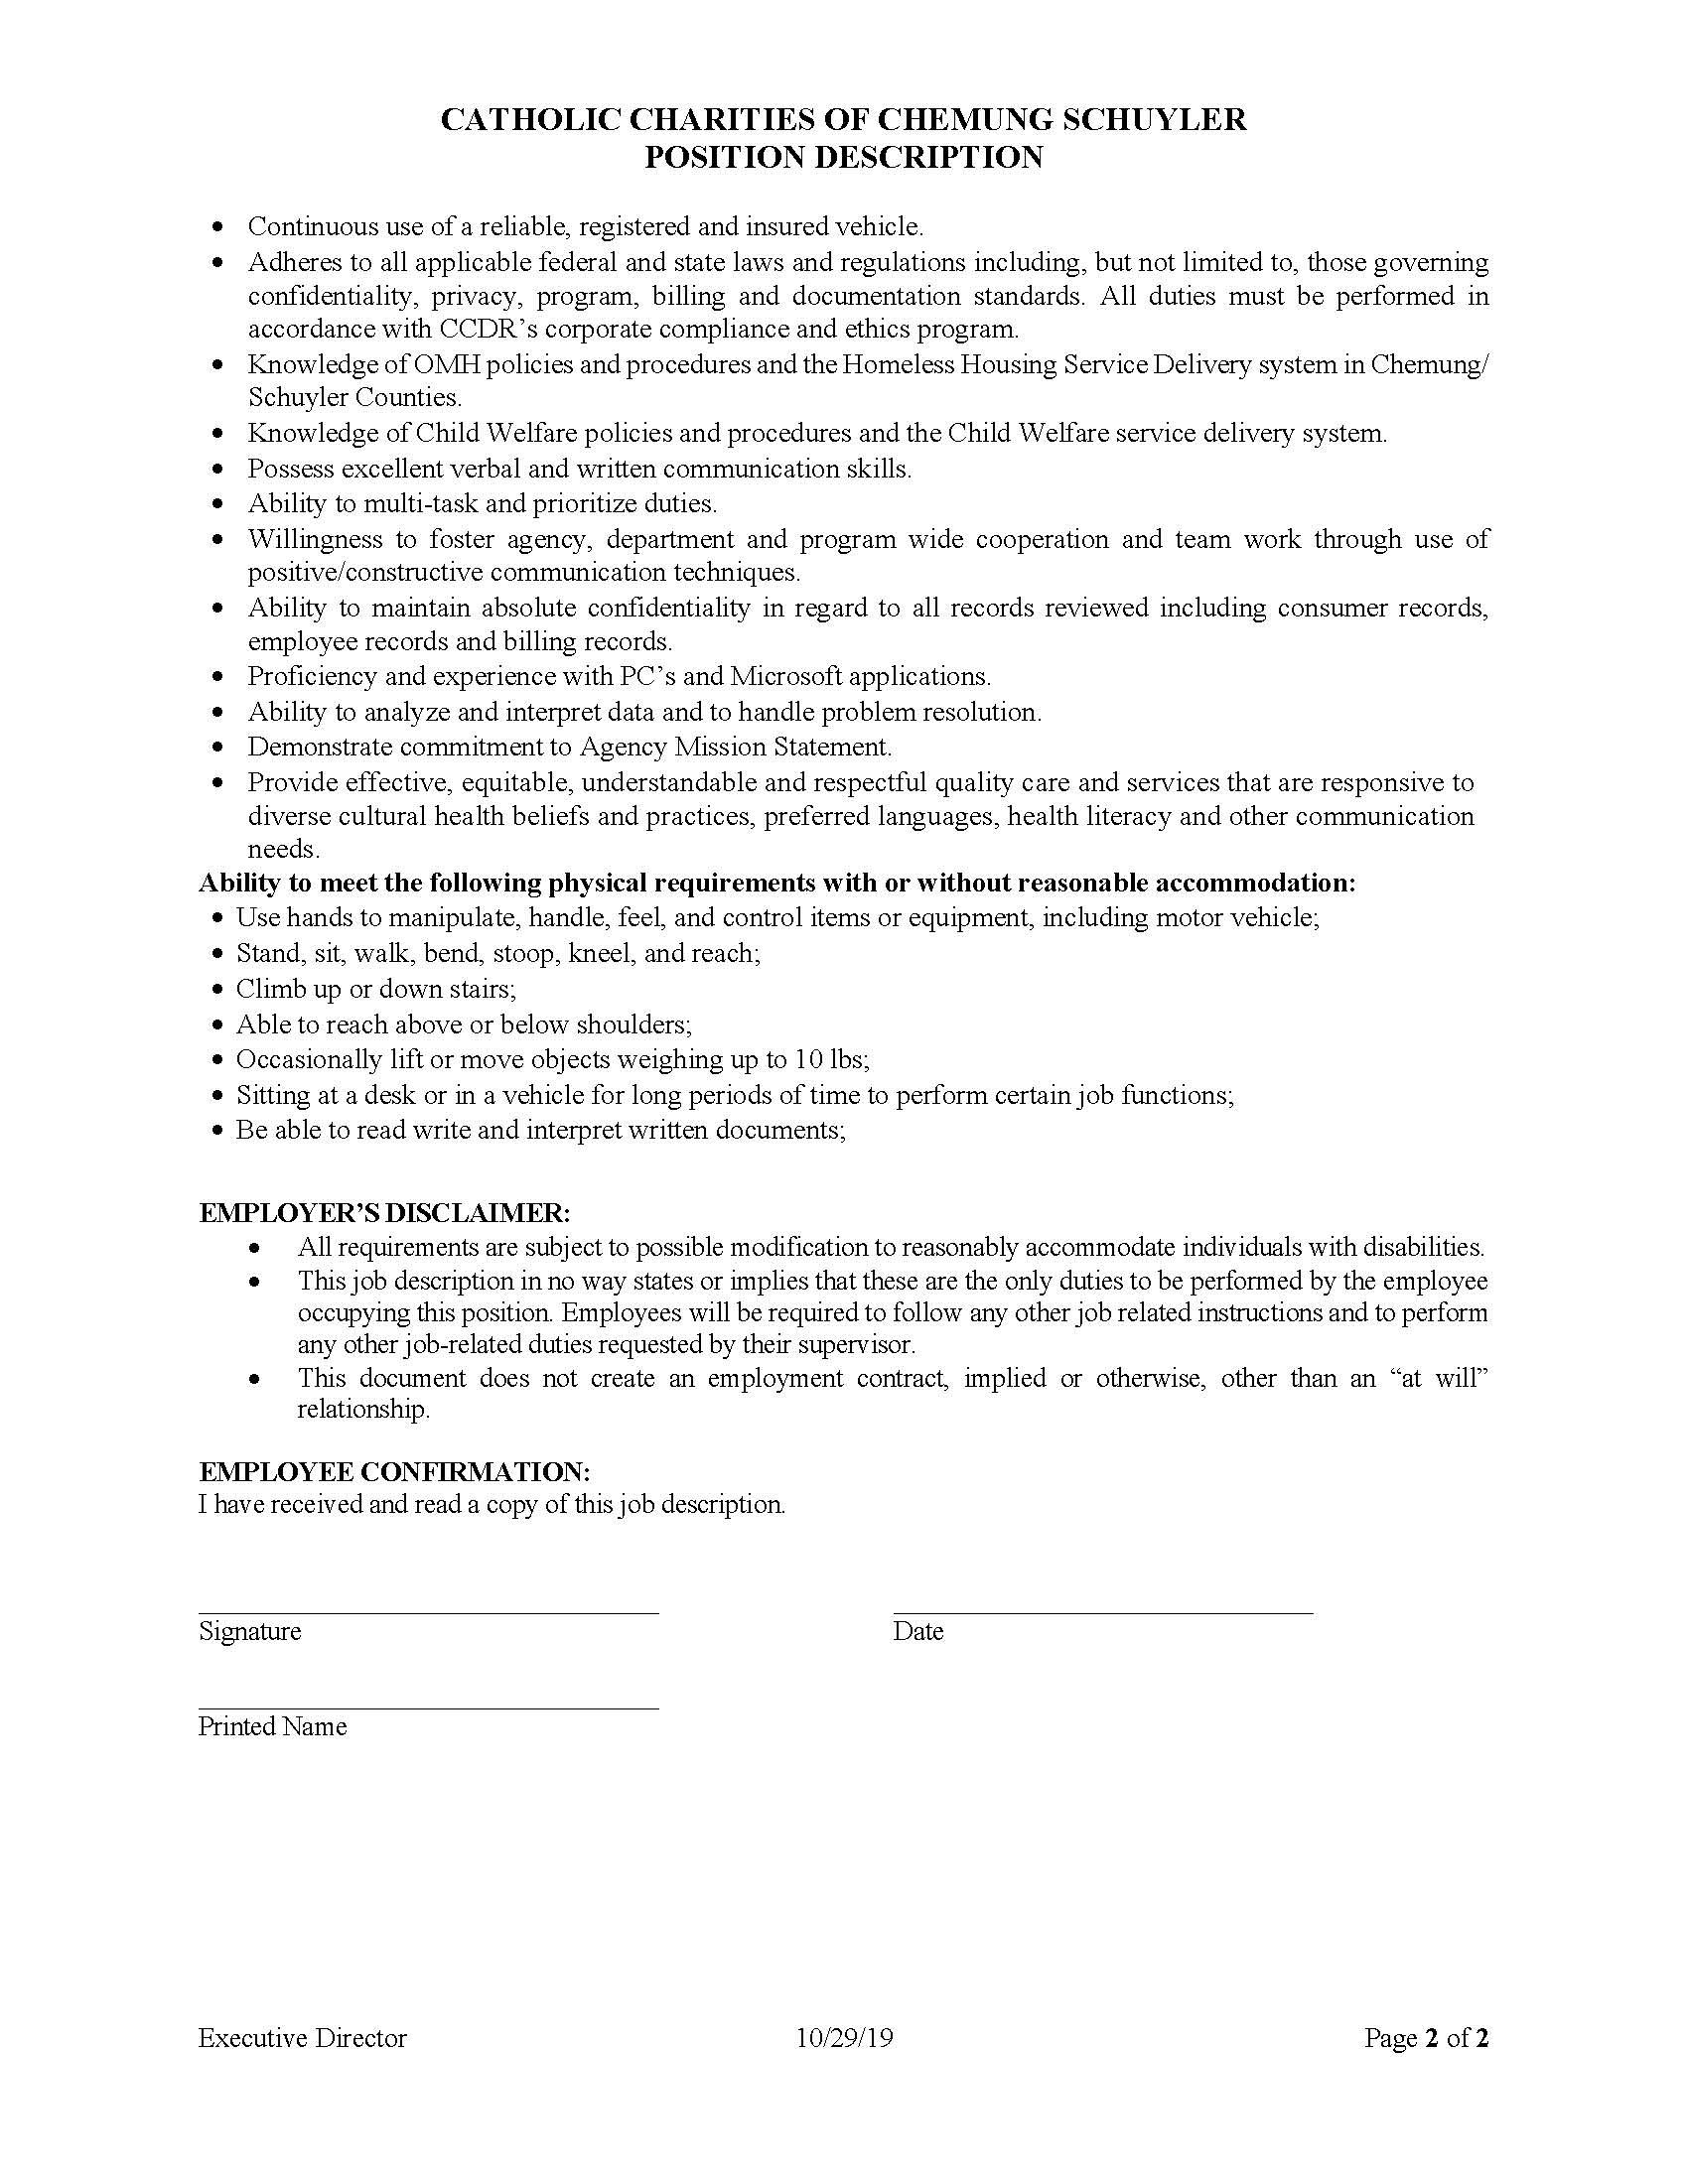 Executive Director Page 2 - Job Post: Catholic Charities of Chemung/Schuyler Executive Director